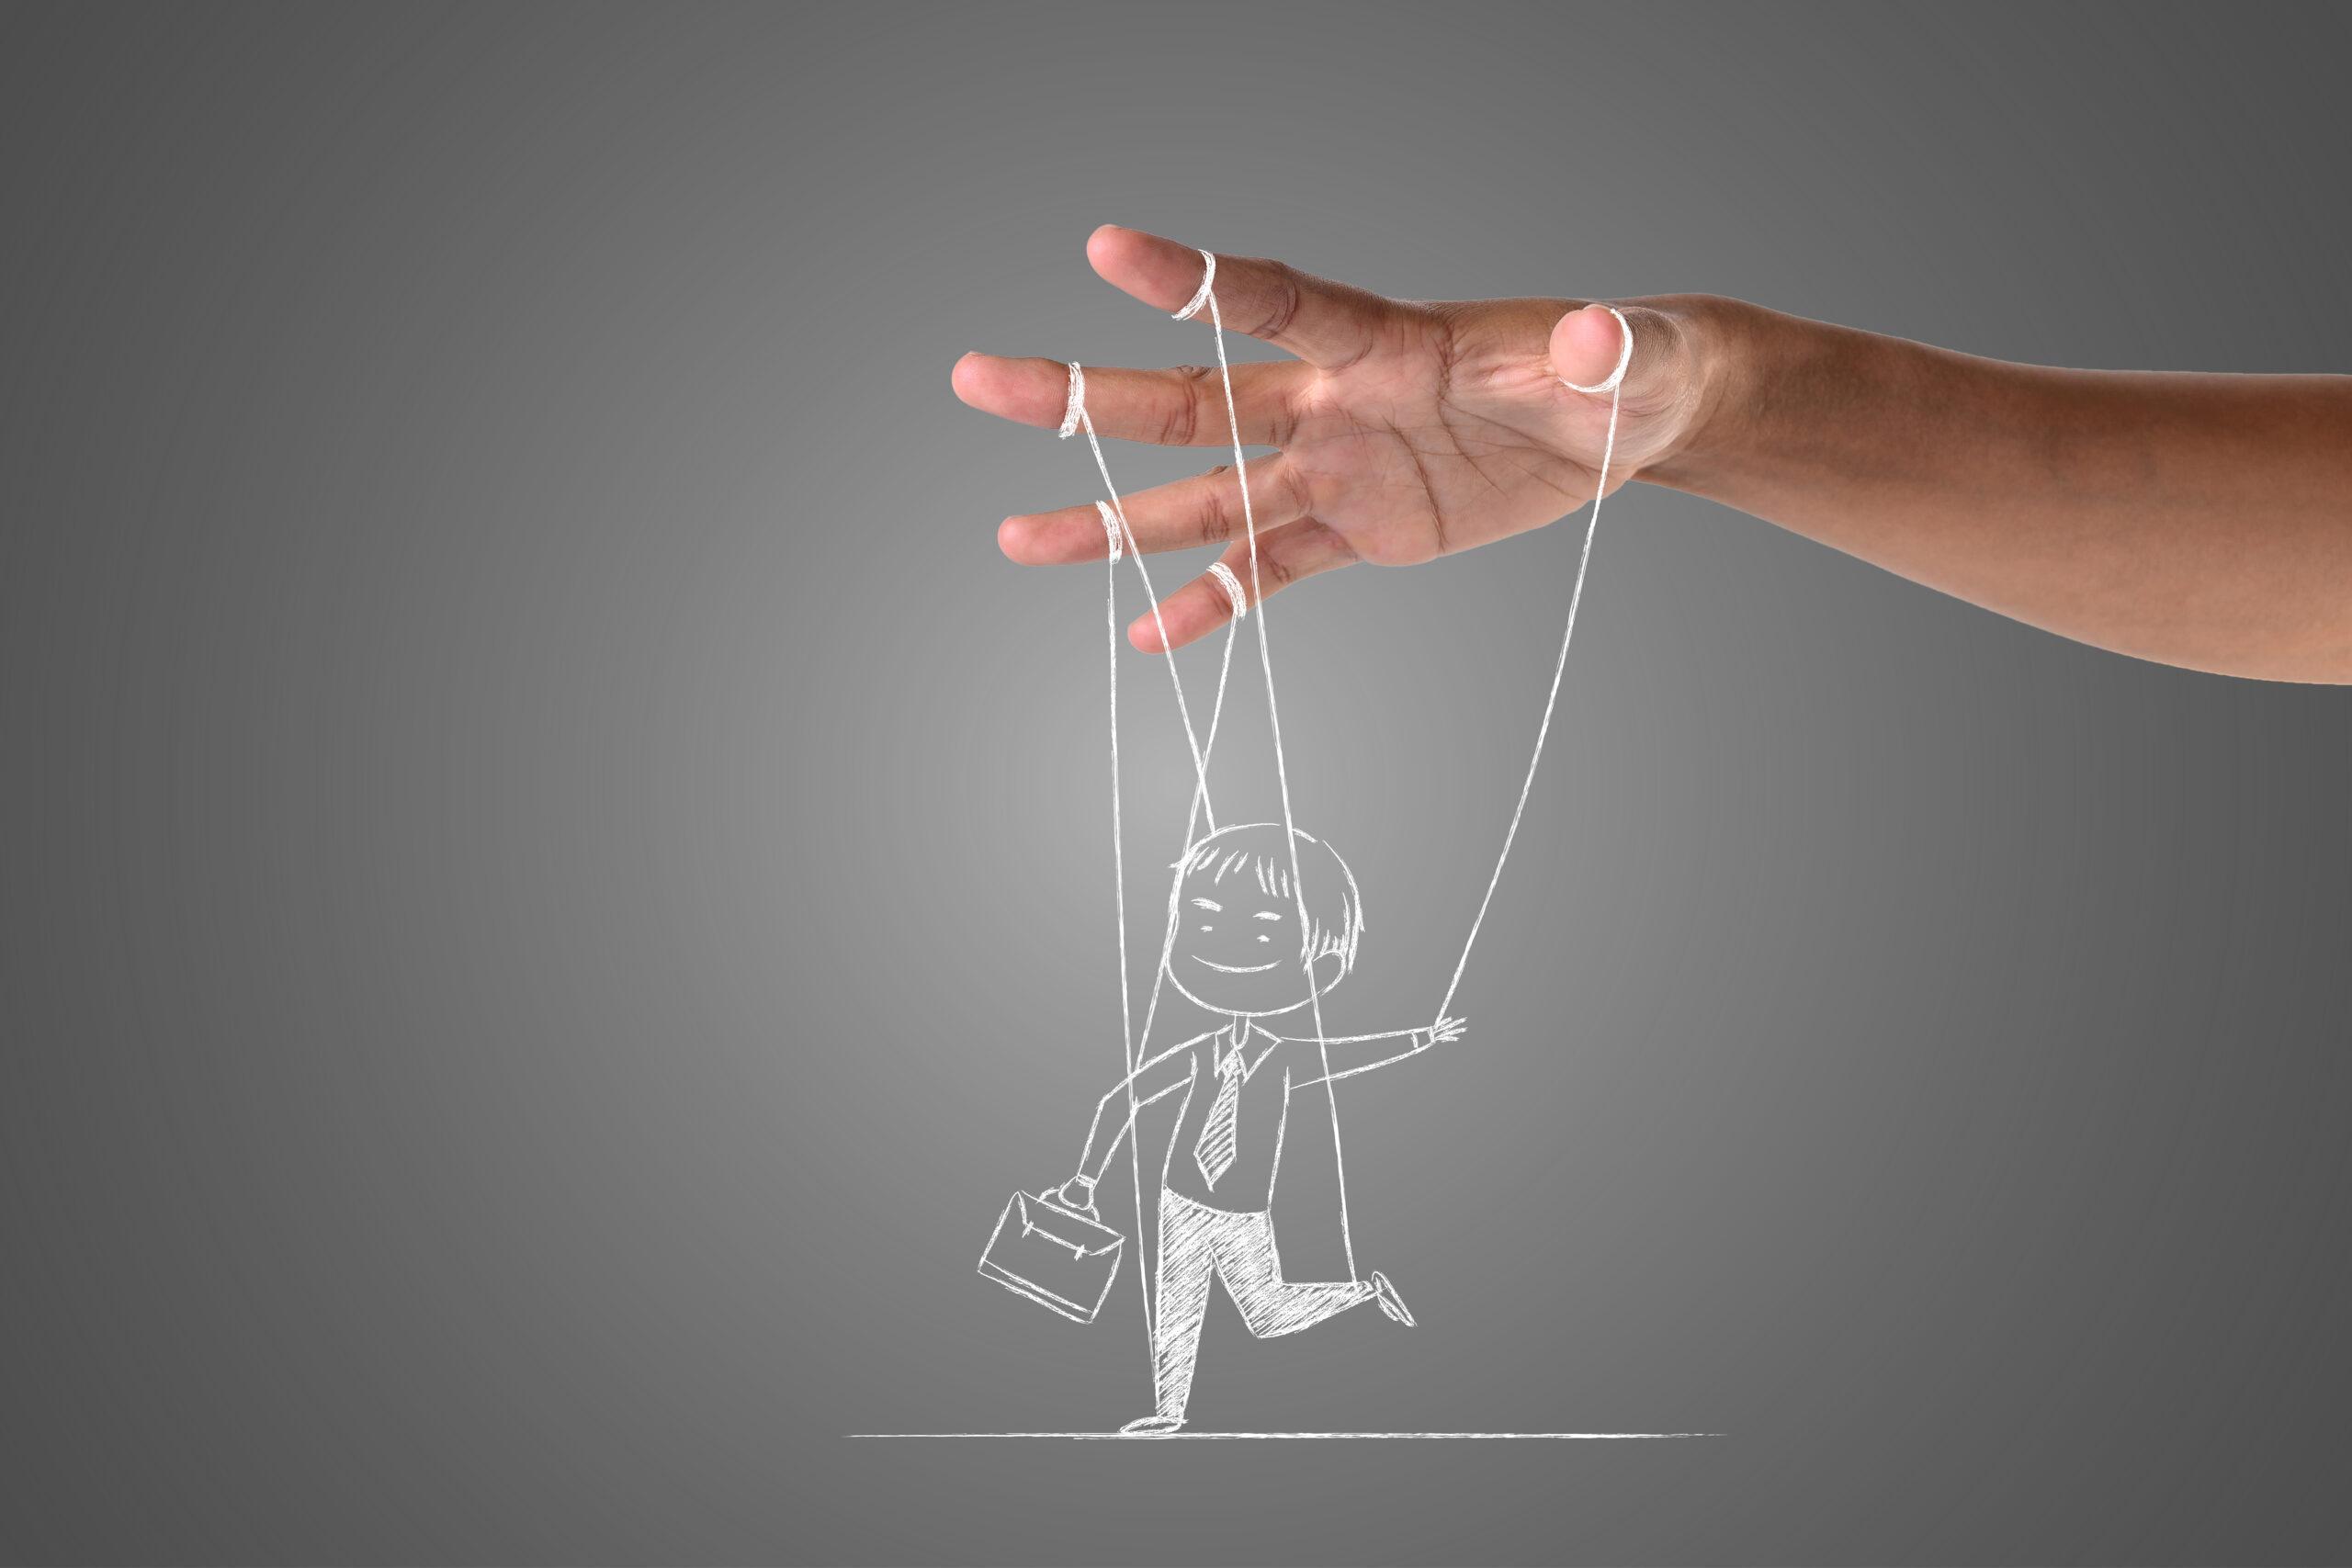 marionetka, kukiełka